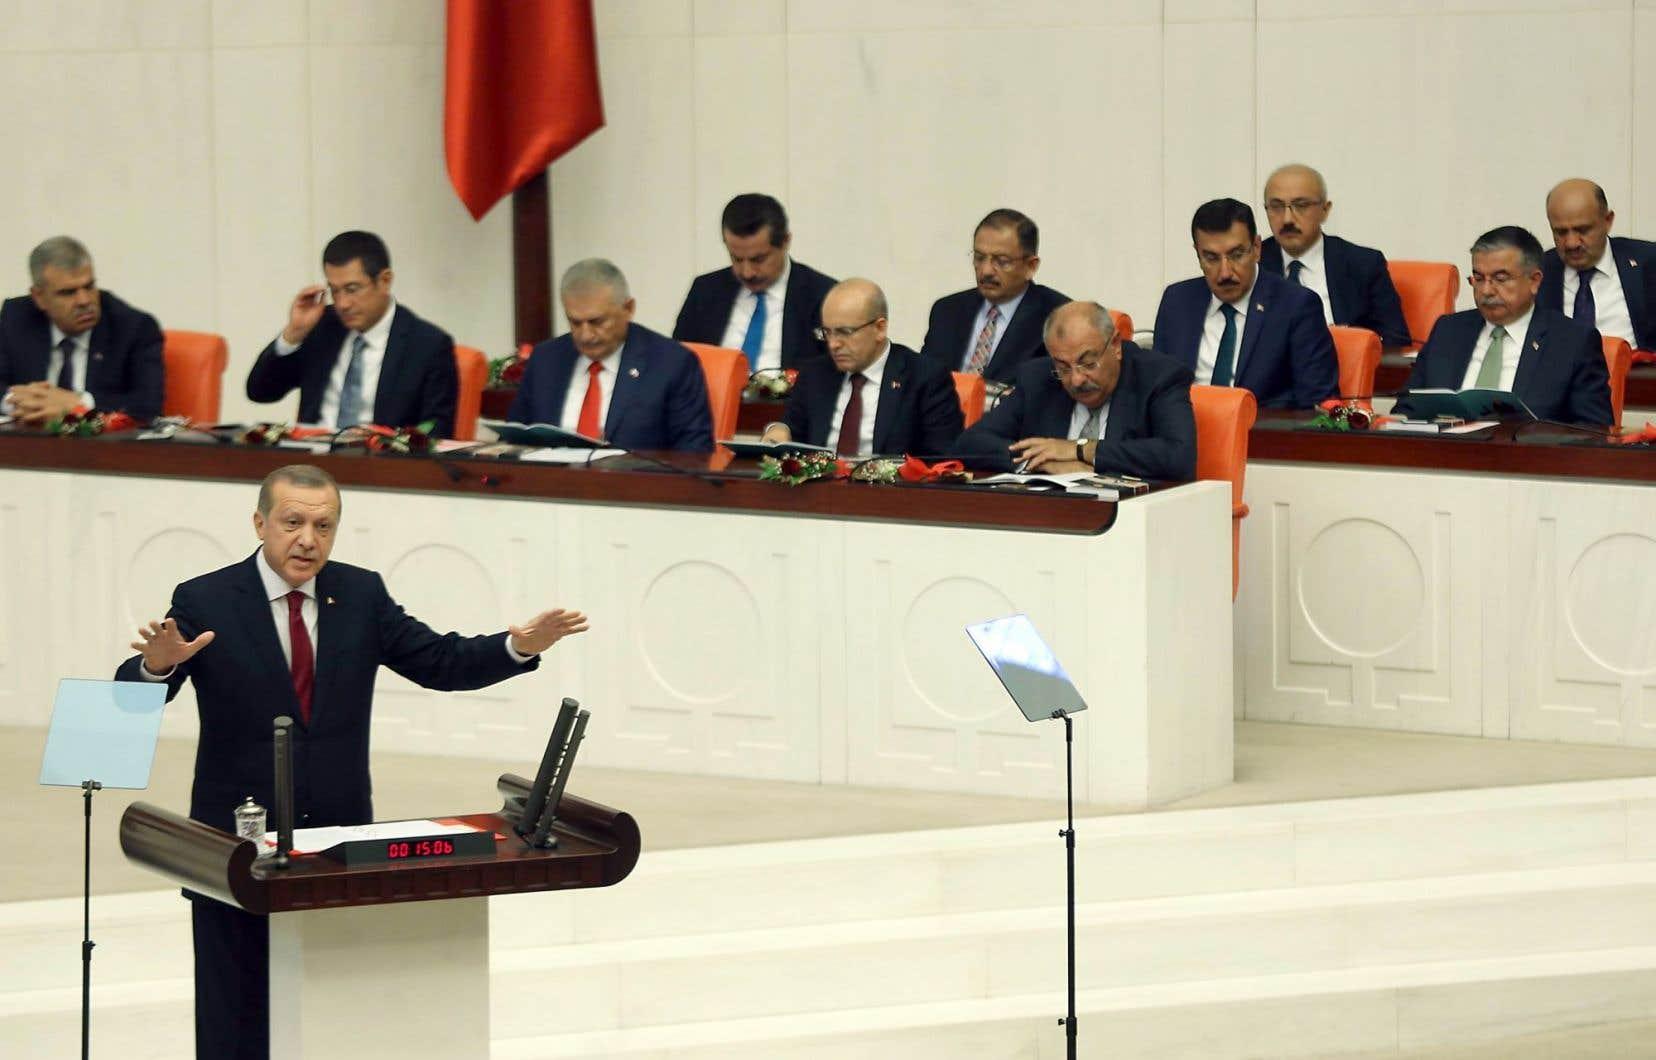 Le président turc, Recep Tayyip Erdogan s'est adressé au parlement samedi.